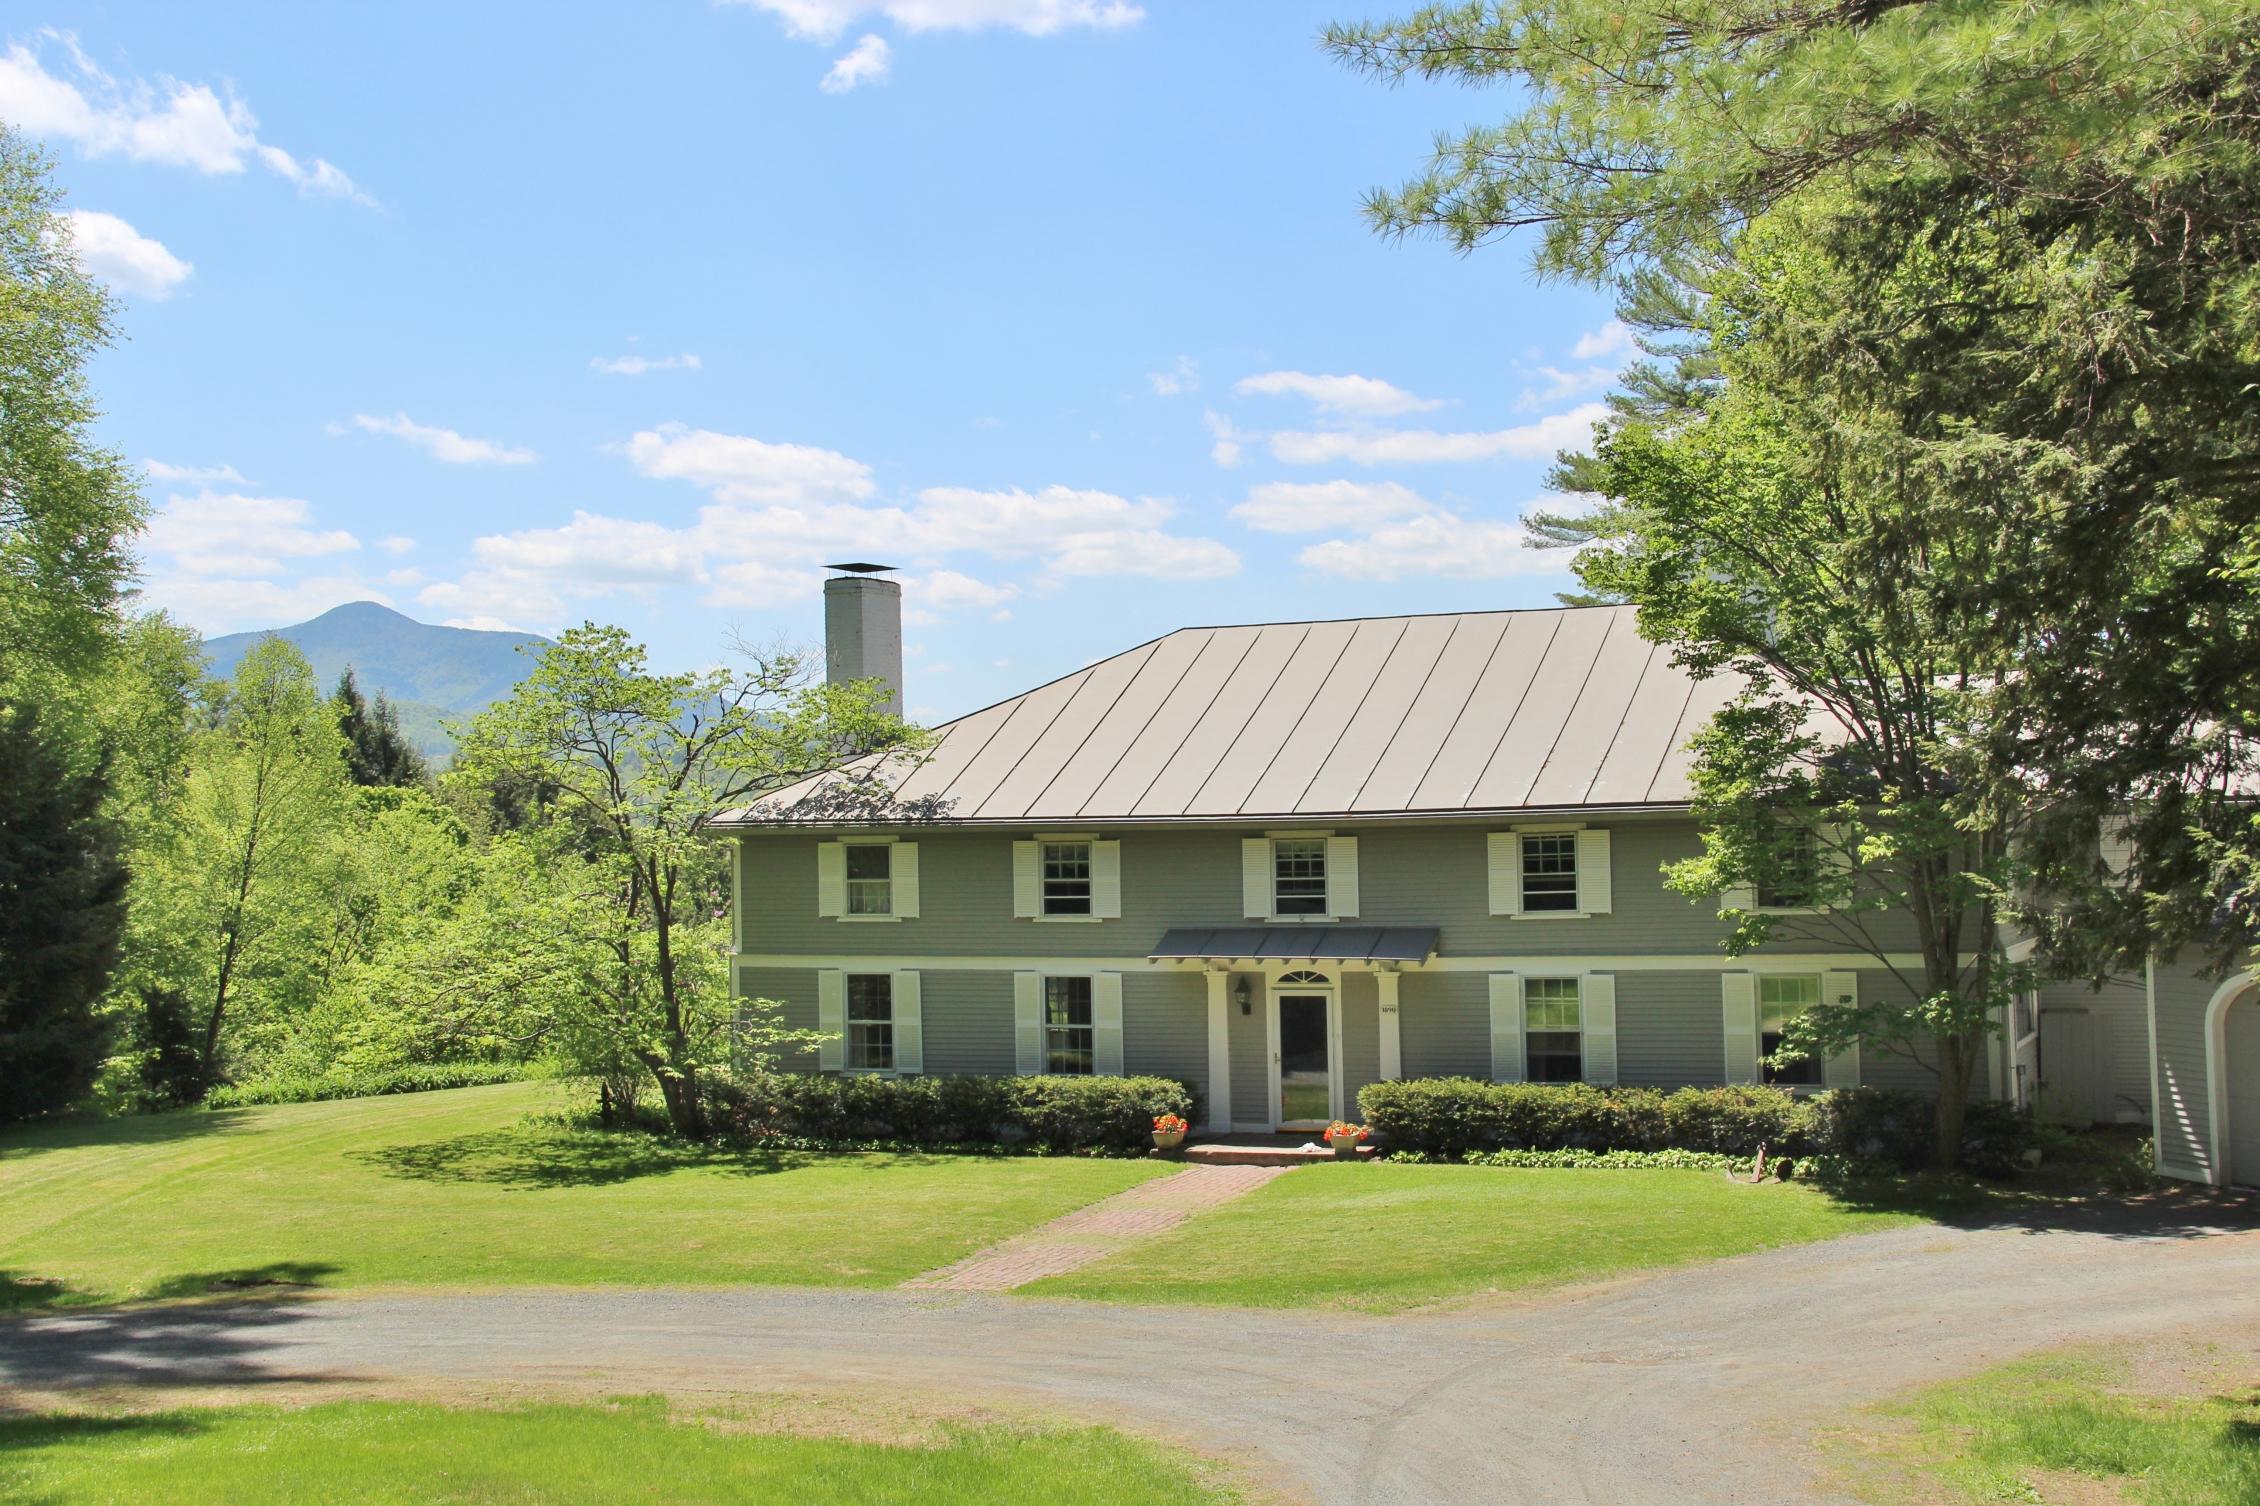 Single Family Home for Sale at 193 Platt Road, Cornish 193 Platt Rd Cornish, New Hampshire 03745 United States